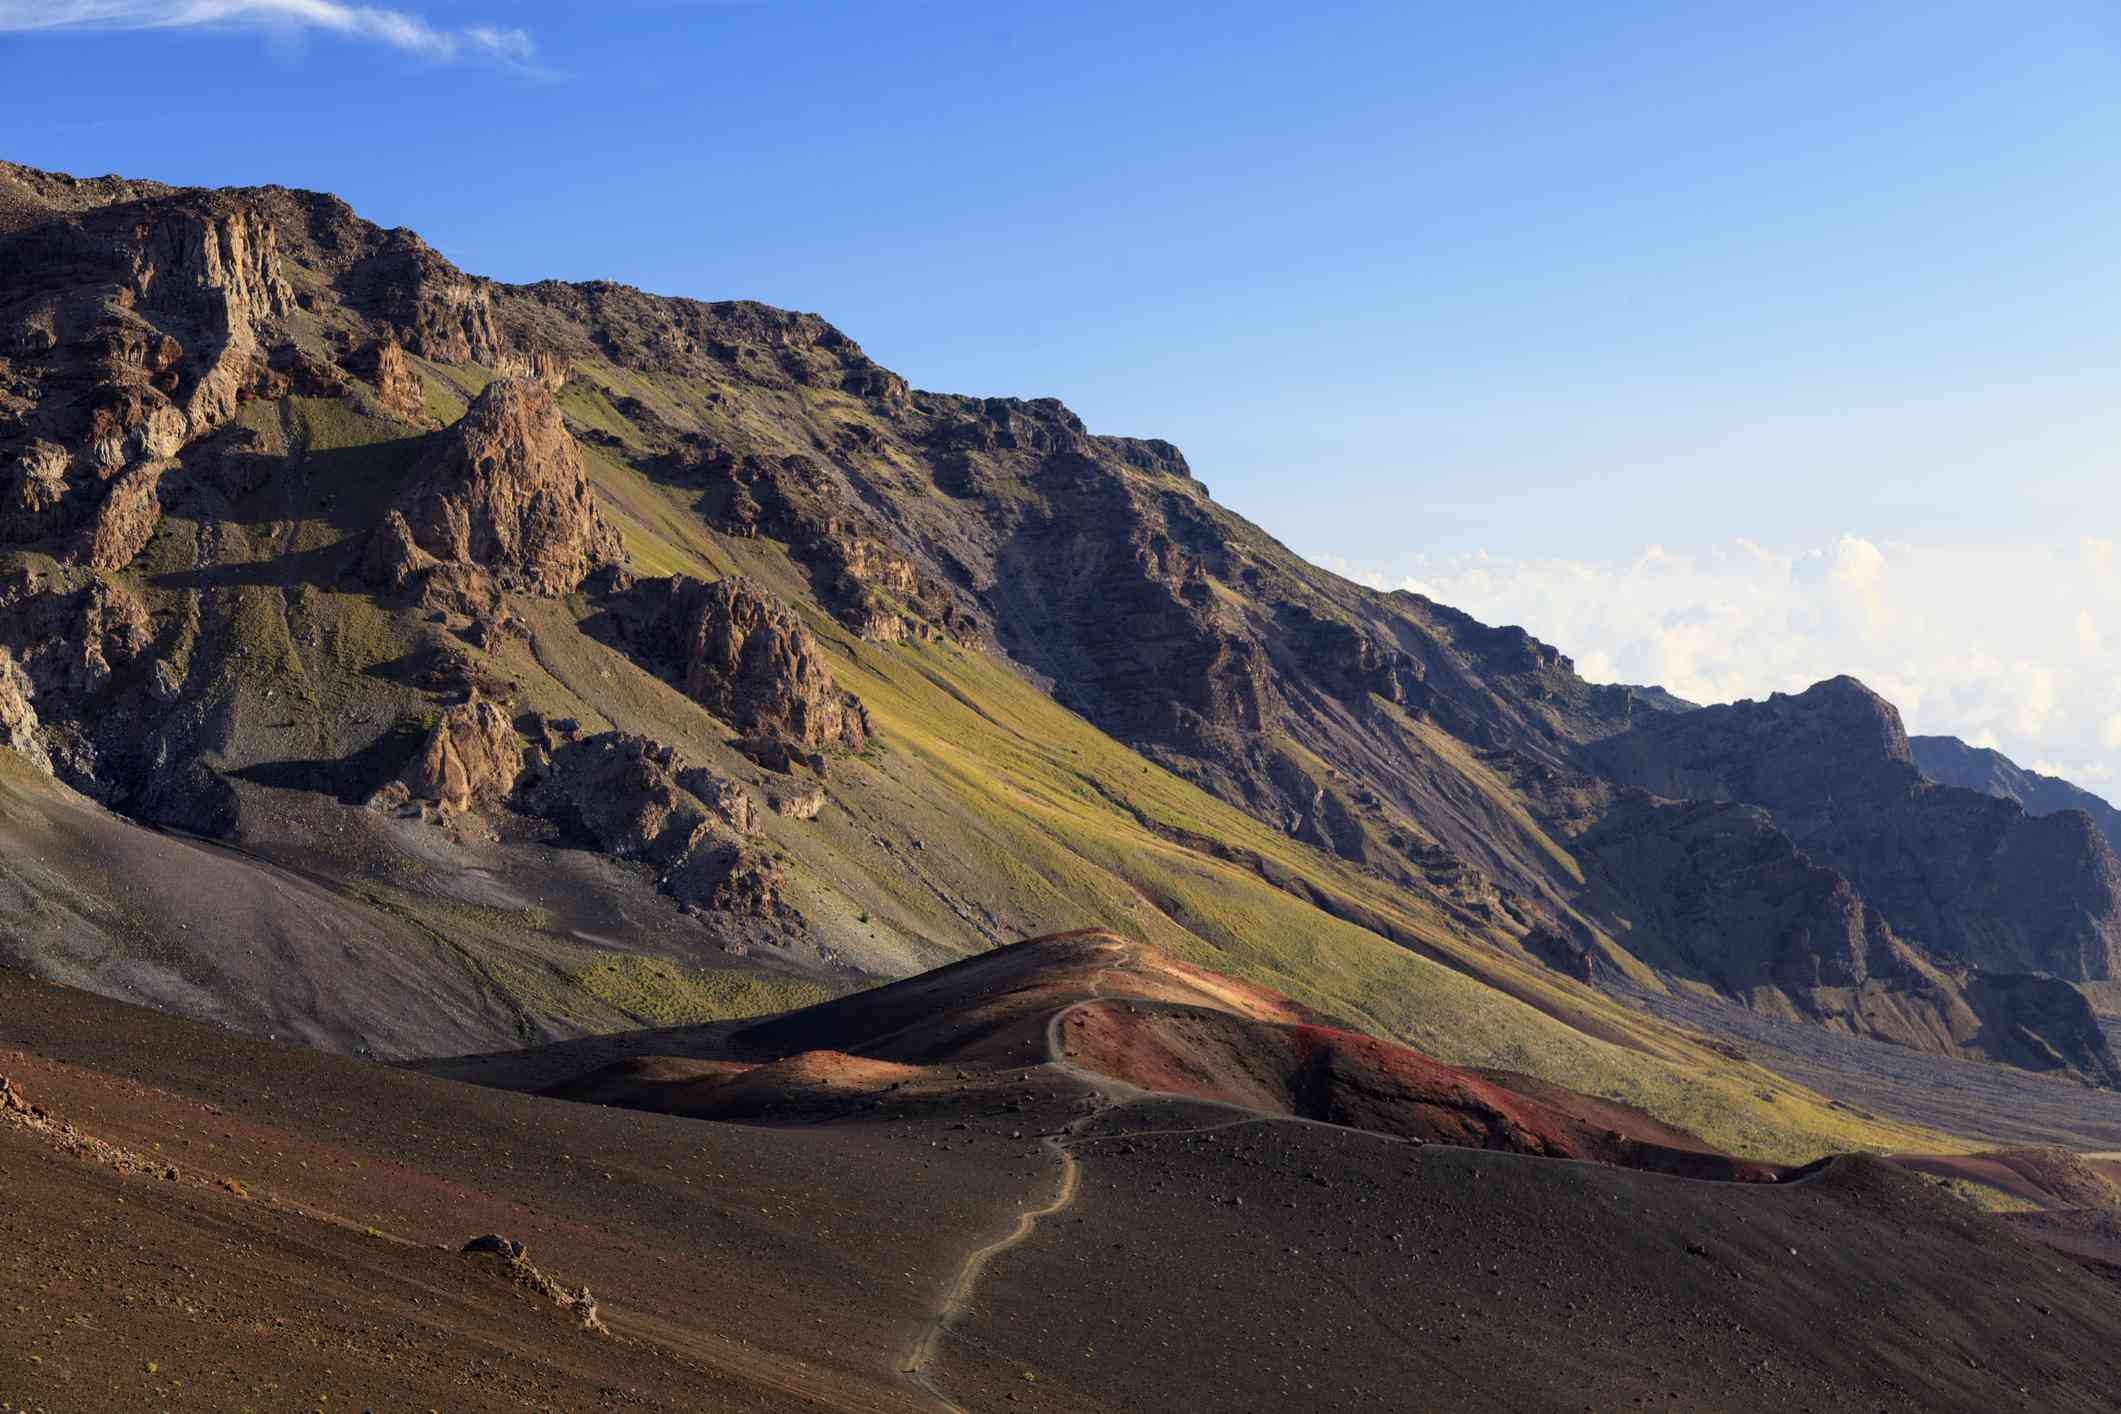 Sliding Sands Trail in Haleakala National Park on Maui